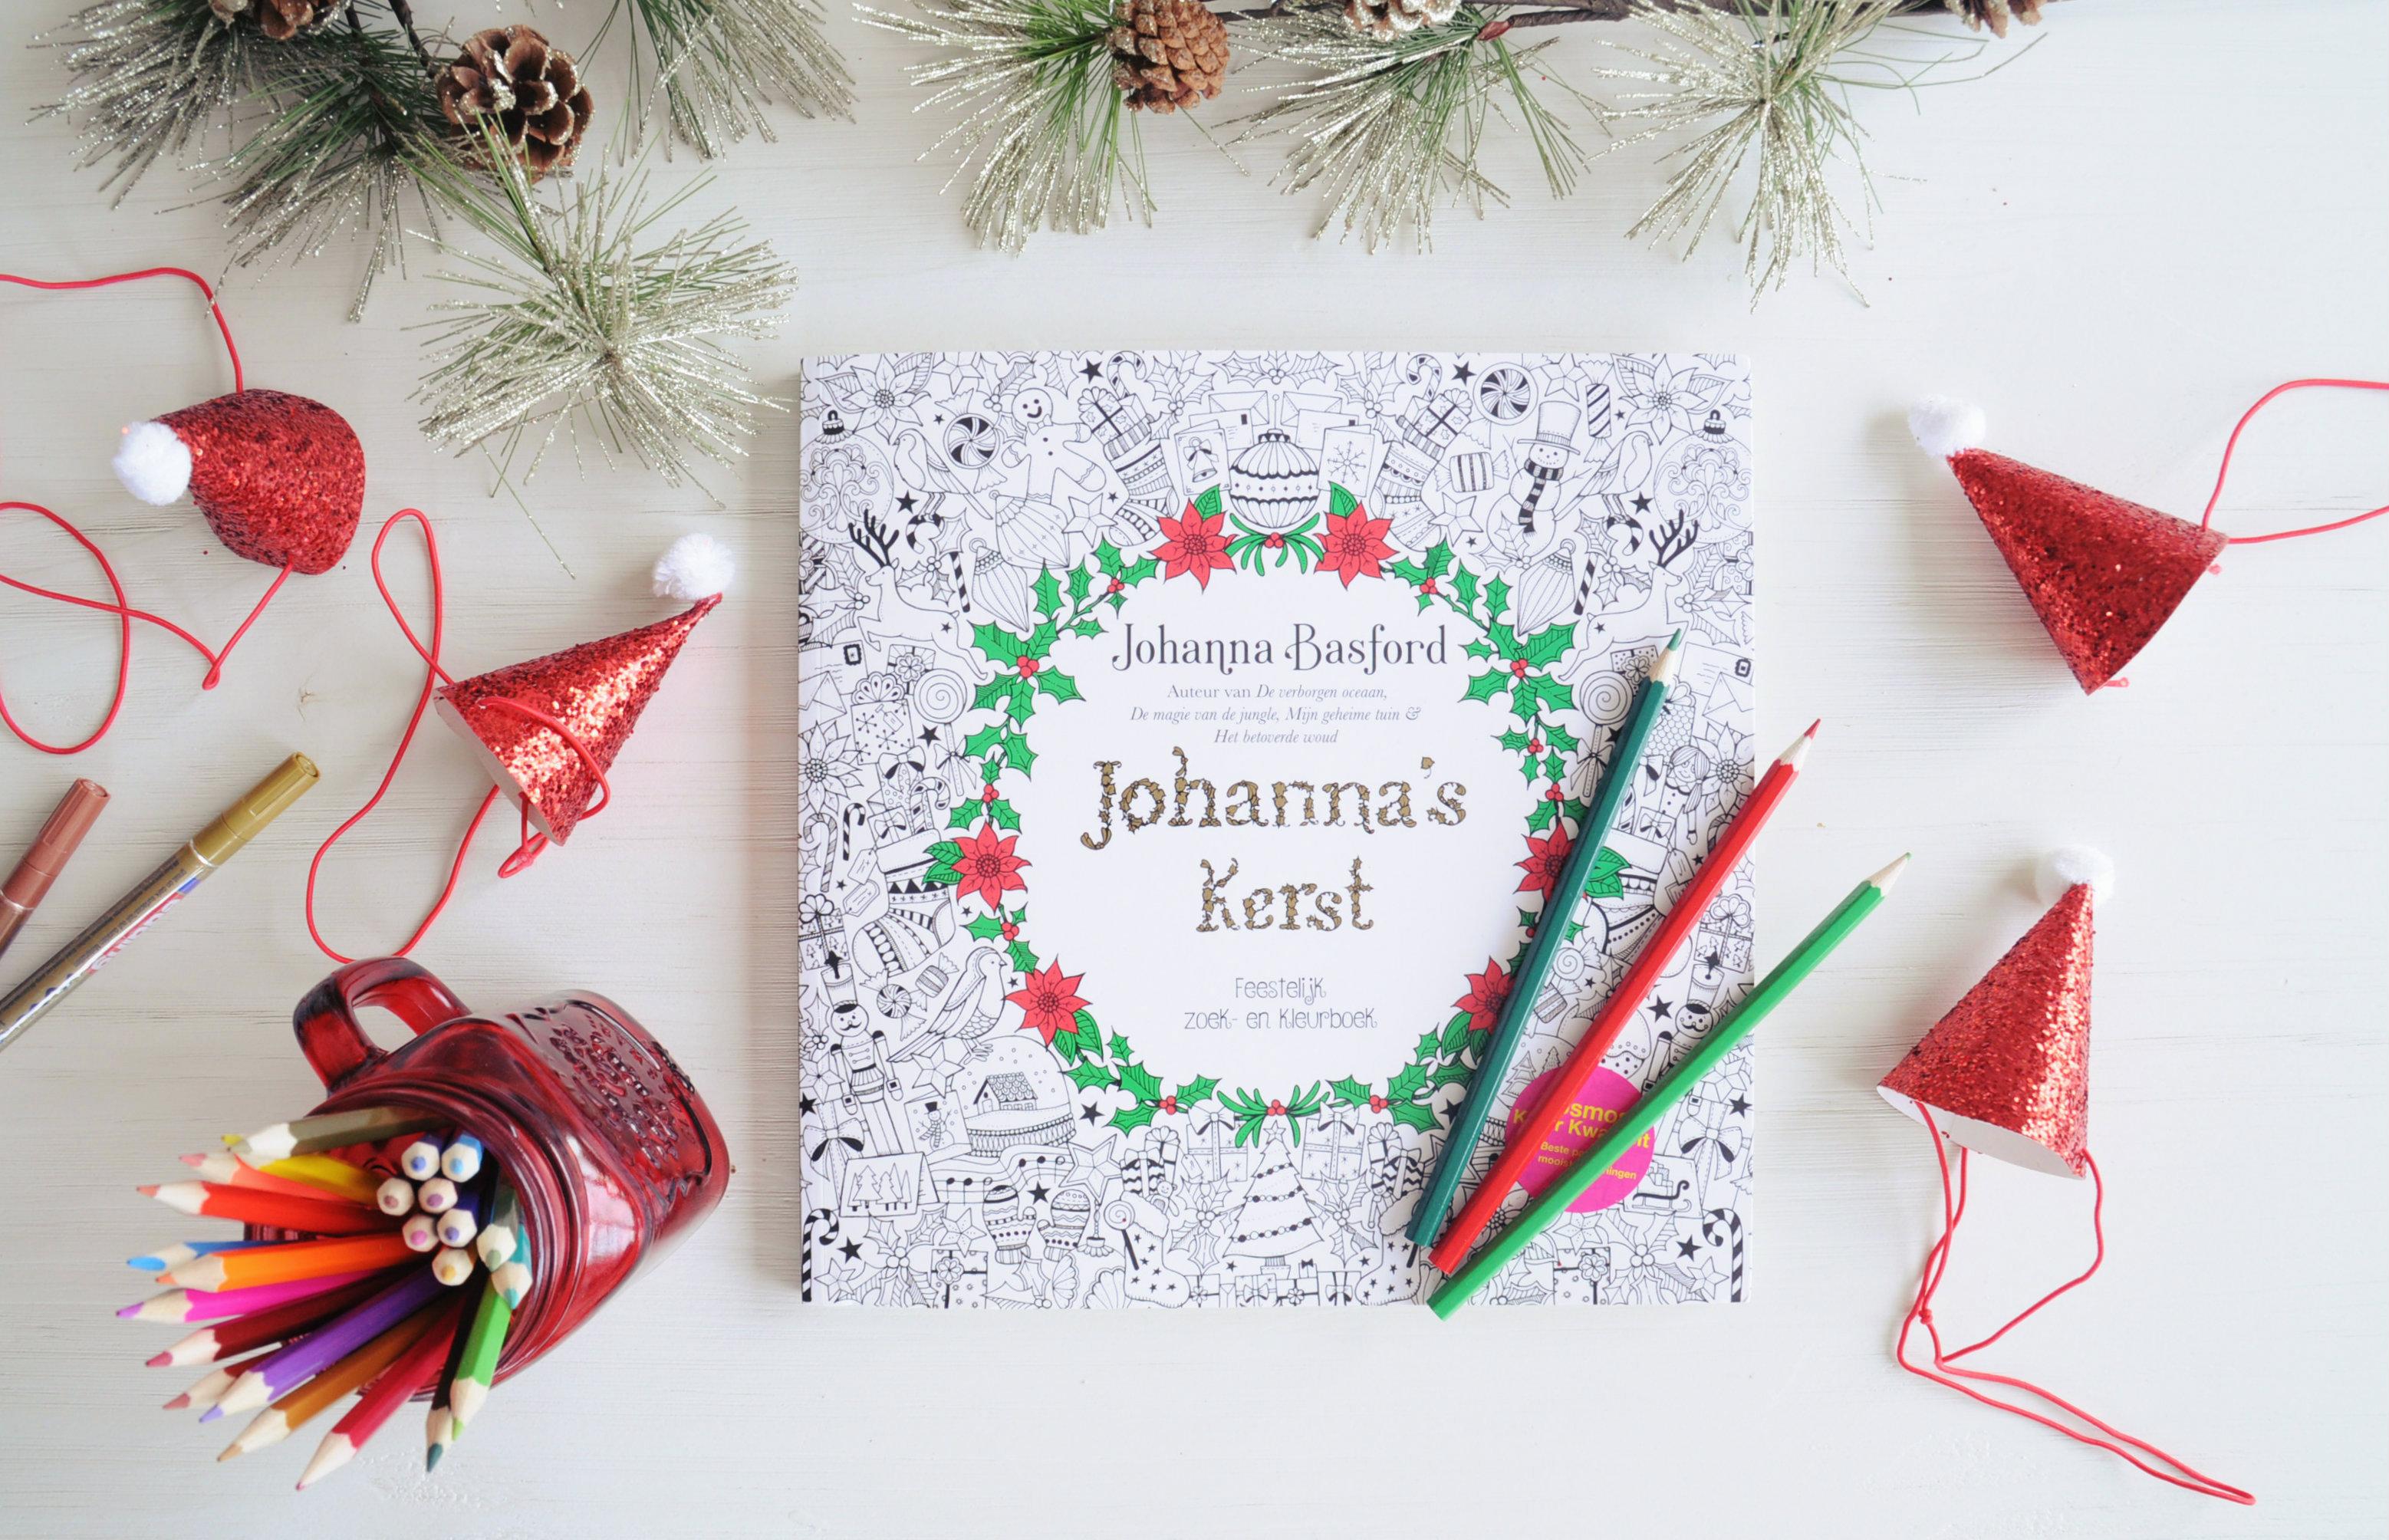 kerst-kleurboek-johannas-kerst